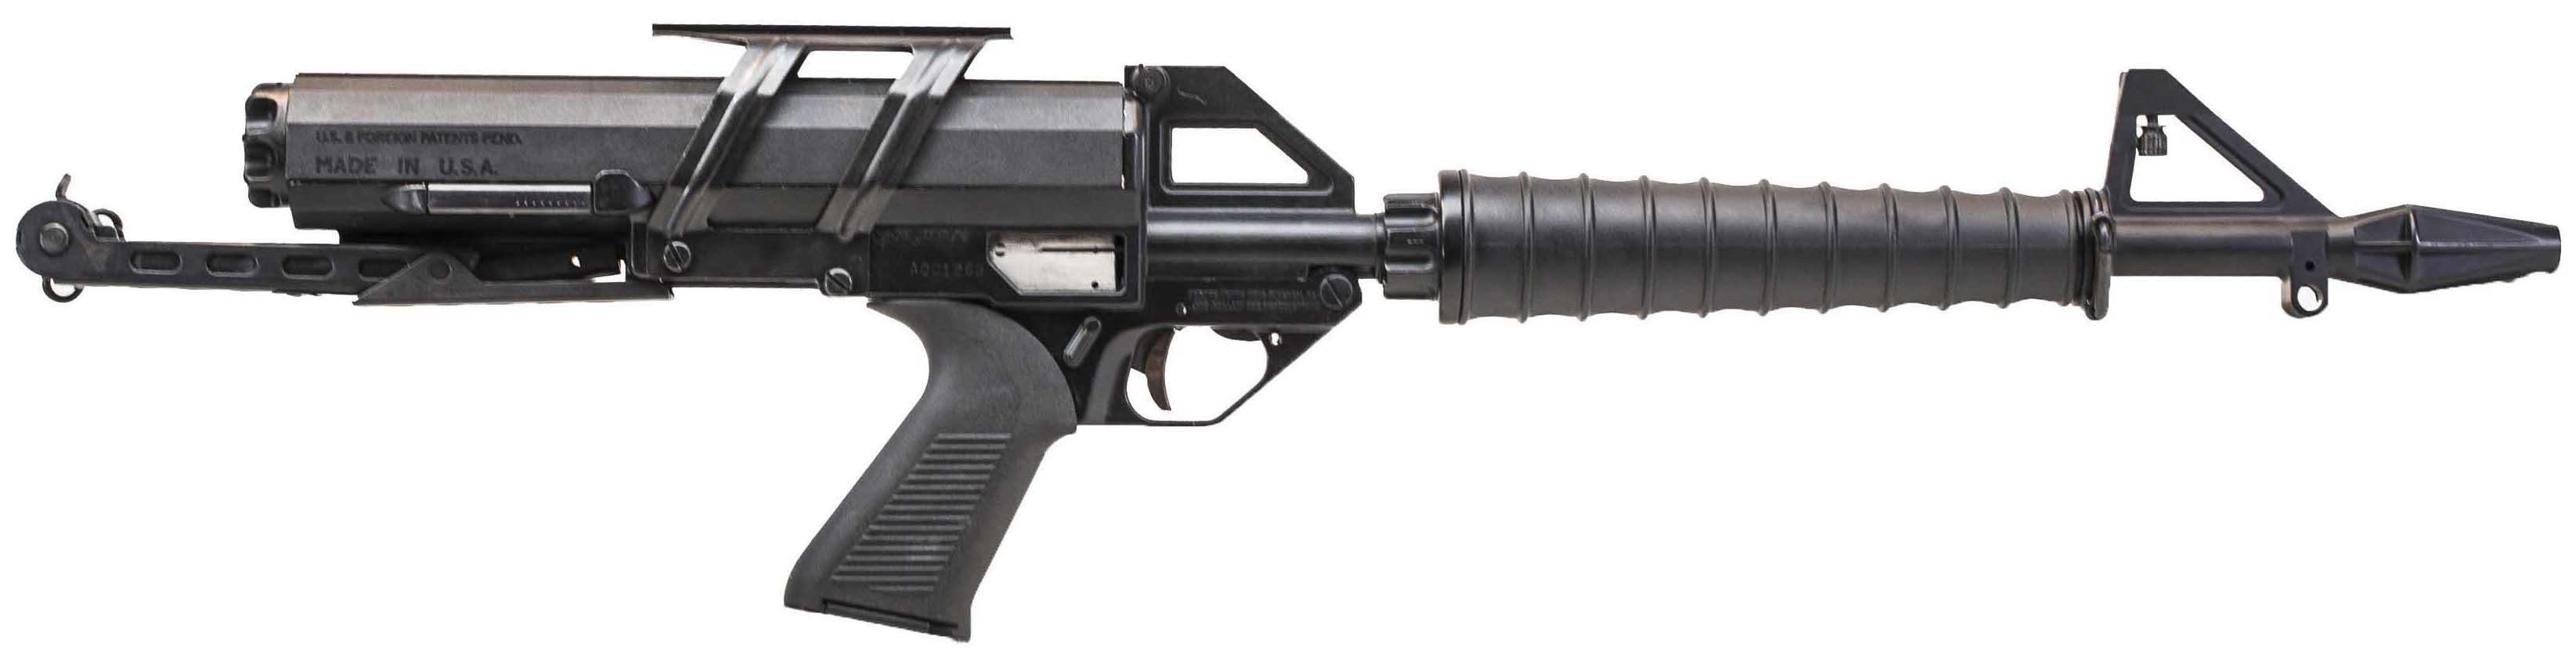 CALICO M-100 Image